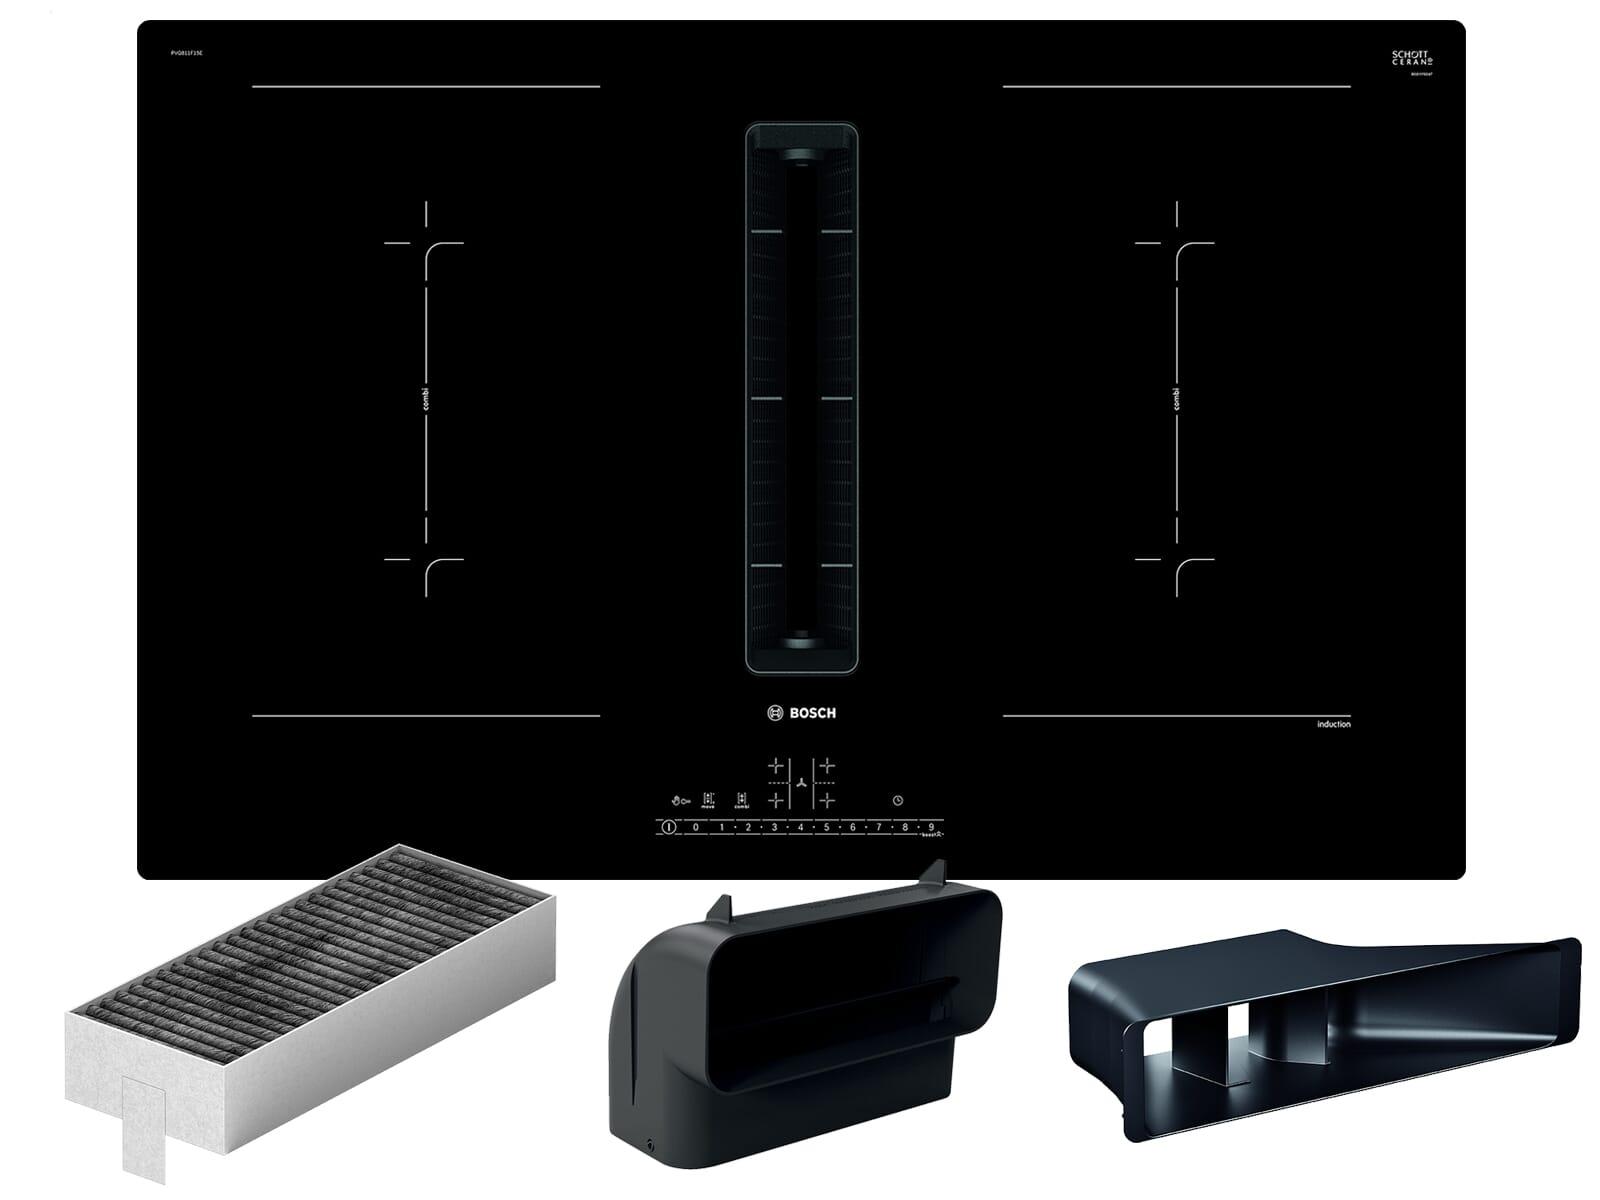 Bosch PVQ811G65 Induktionskochfeld-Dunstabzug-Kombination PVQ811F15E +  Installationszubehör